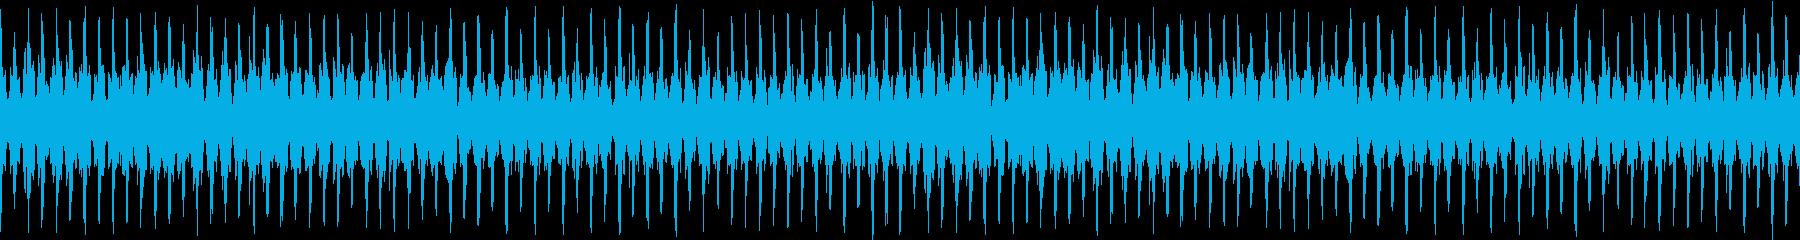 8bitイベントシーンの再生済みの波形